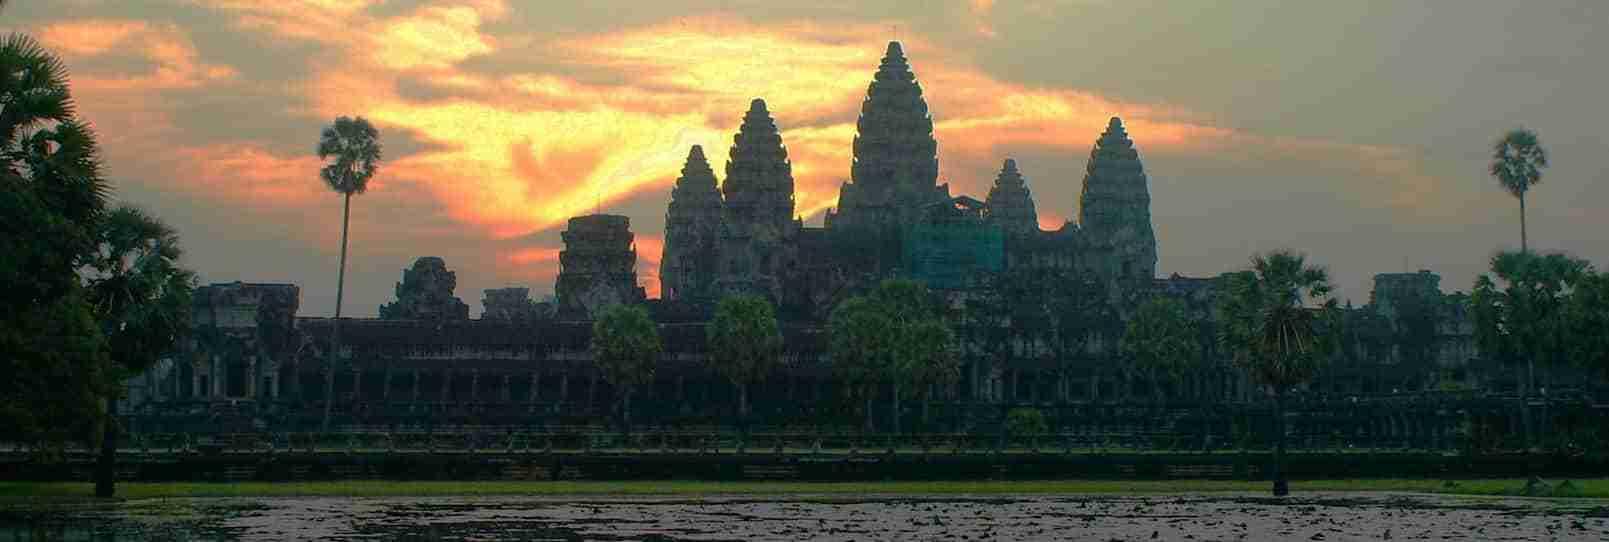 Fun Things To Do In Siem Reap Cambodia